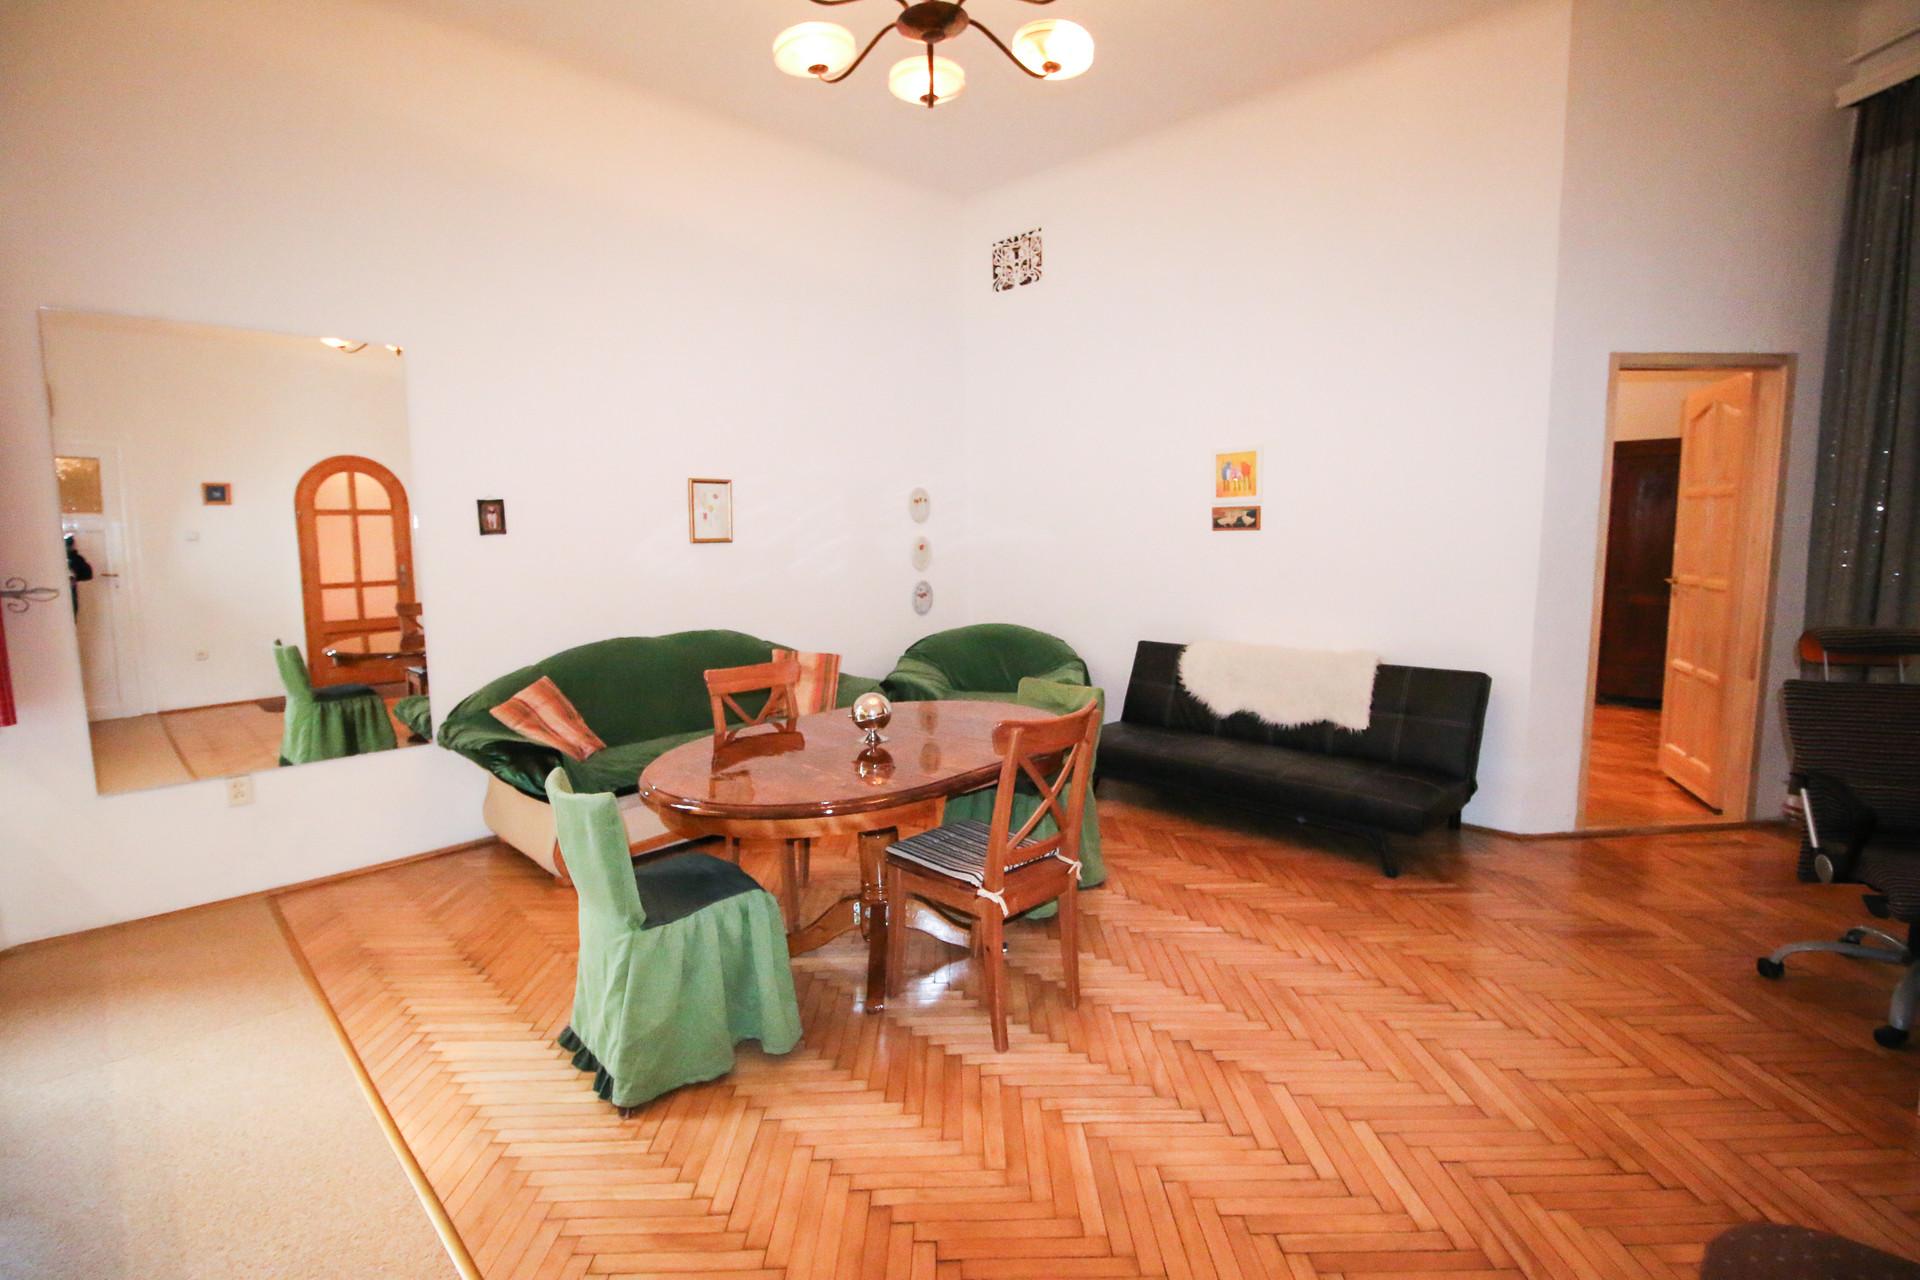 large-3-rooms-apartment-nyugati-72c8f3e1bd52f005a05297ab772724b7